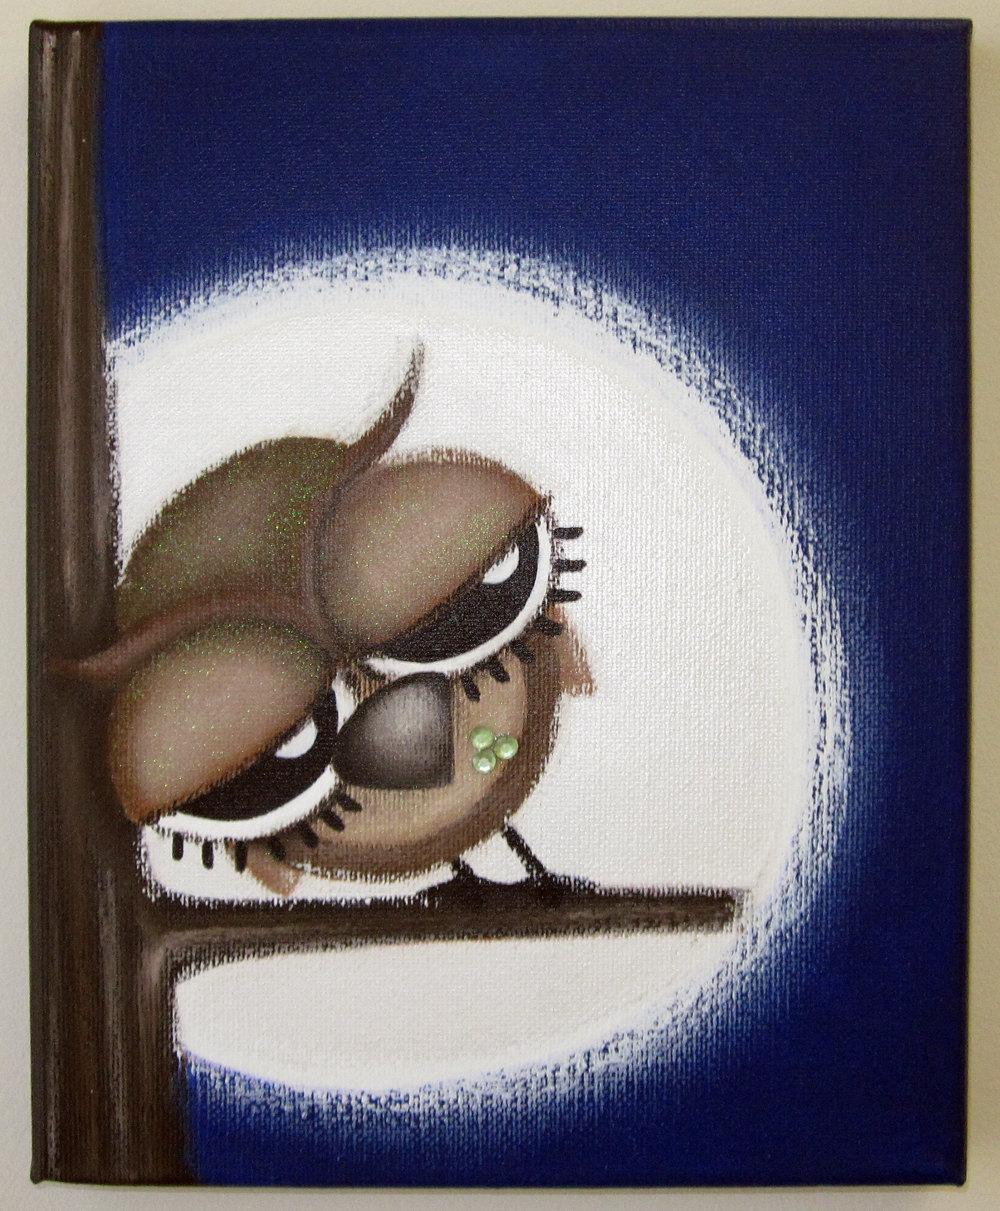 sLeePy oWL 8x10 original painting on canvas by art4barewalls